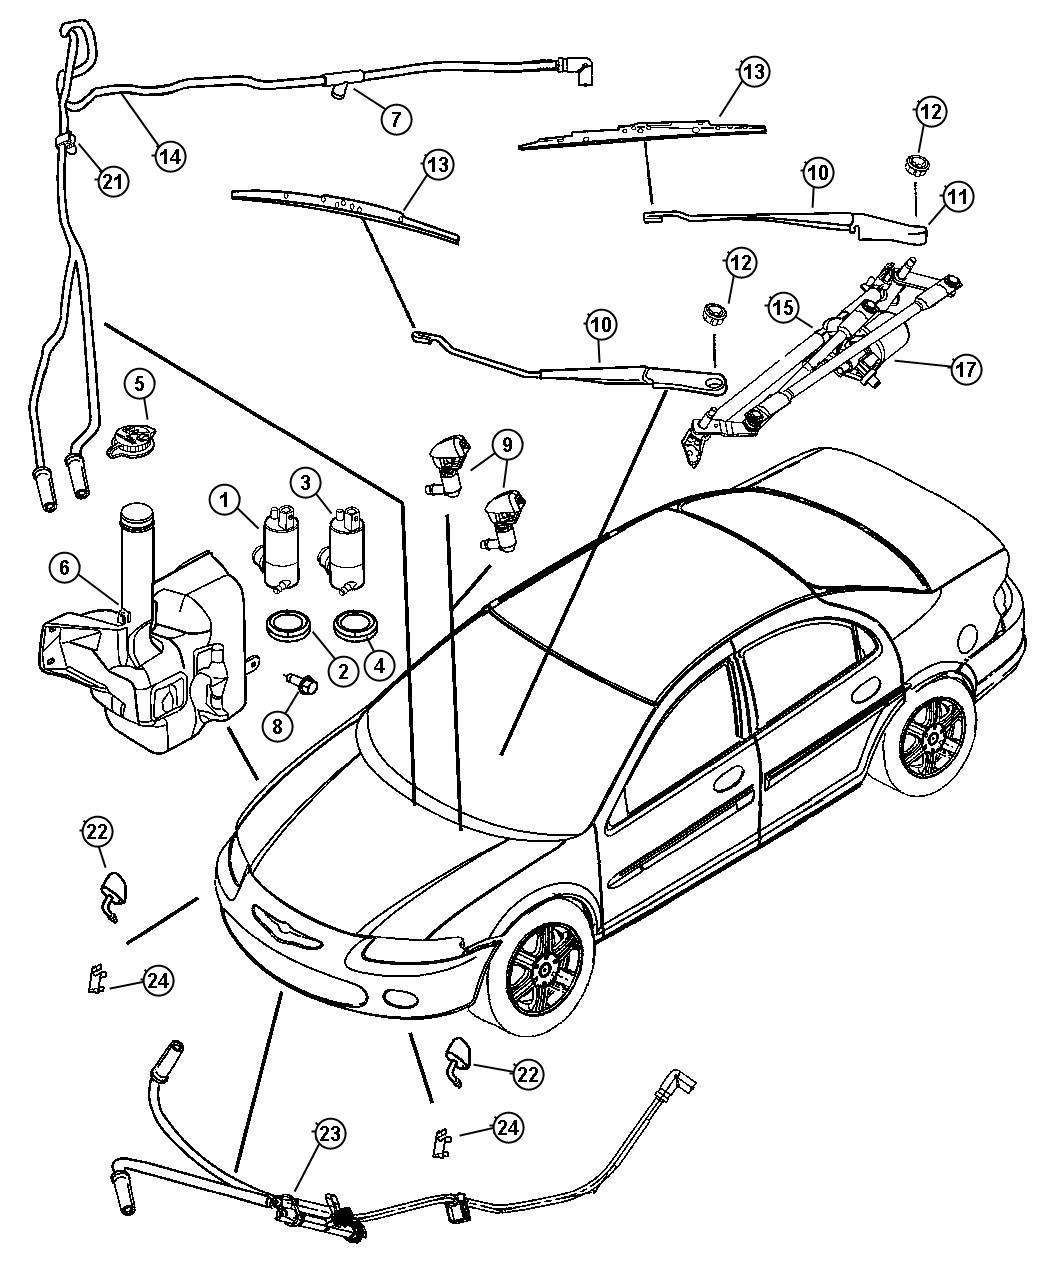 Chrysler Sebring Windshield Washer And Wiper System